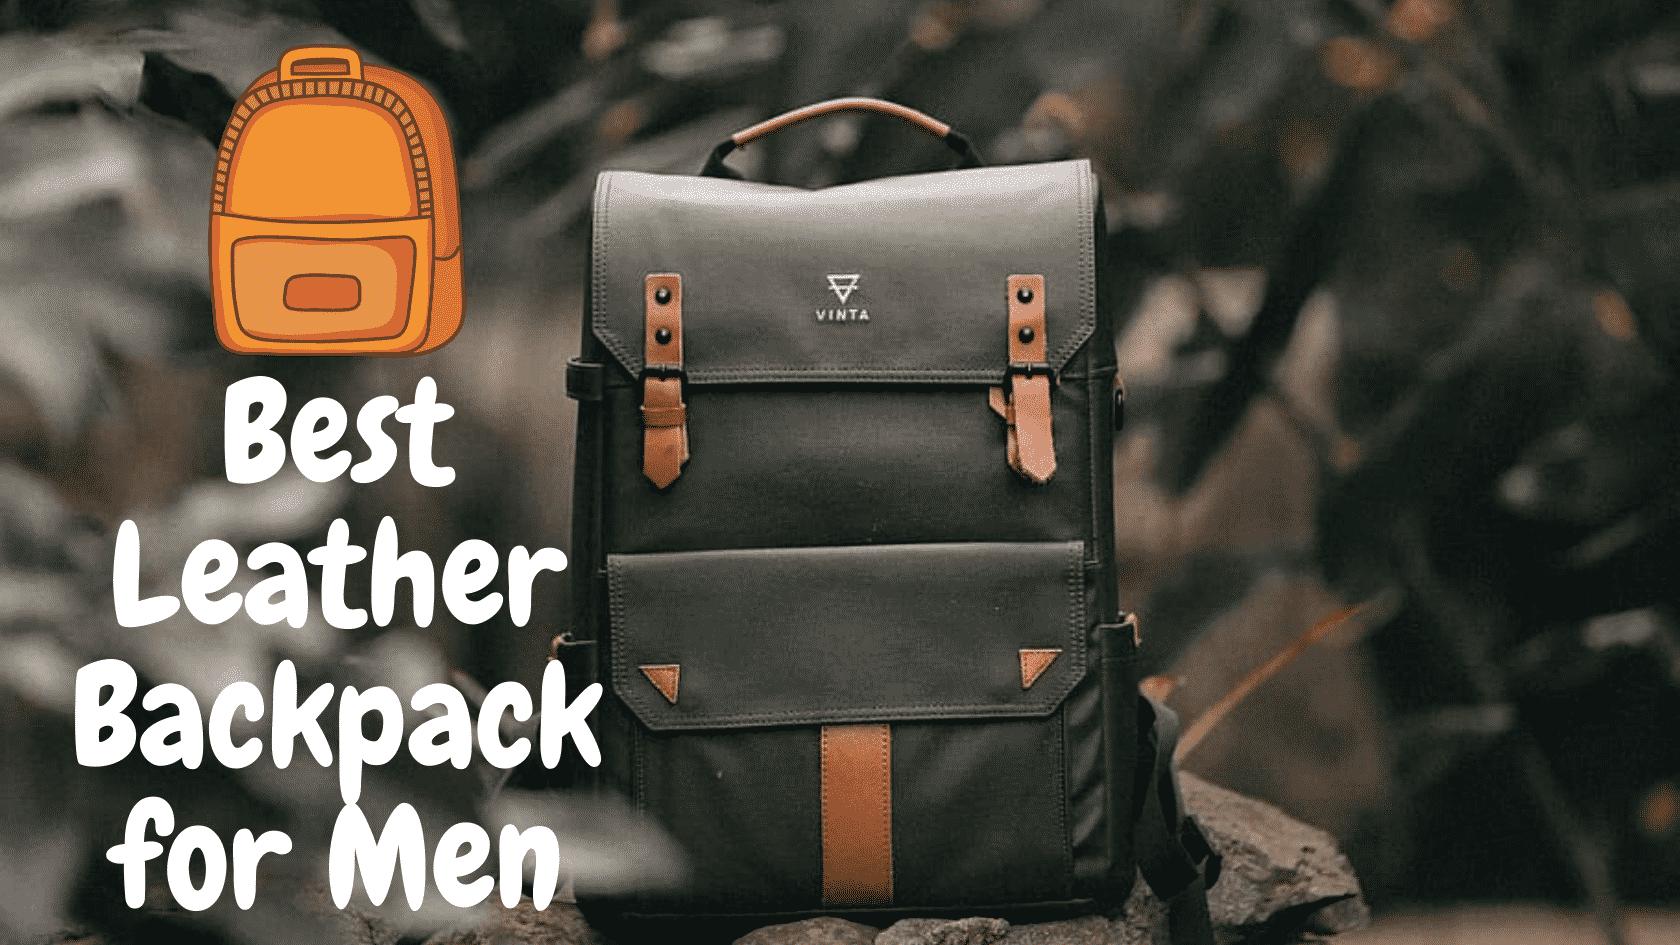 Best leather backpack for Men